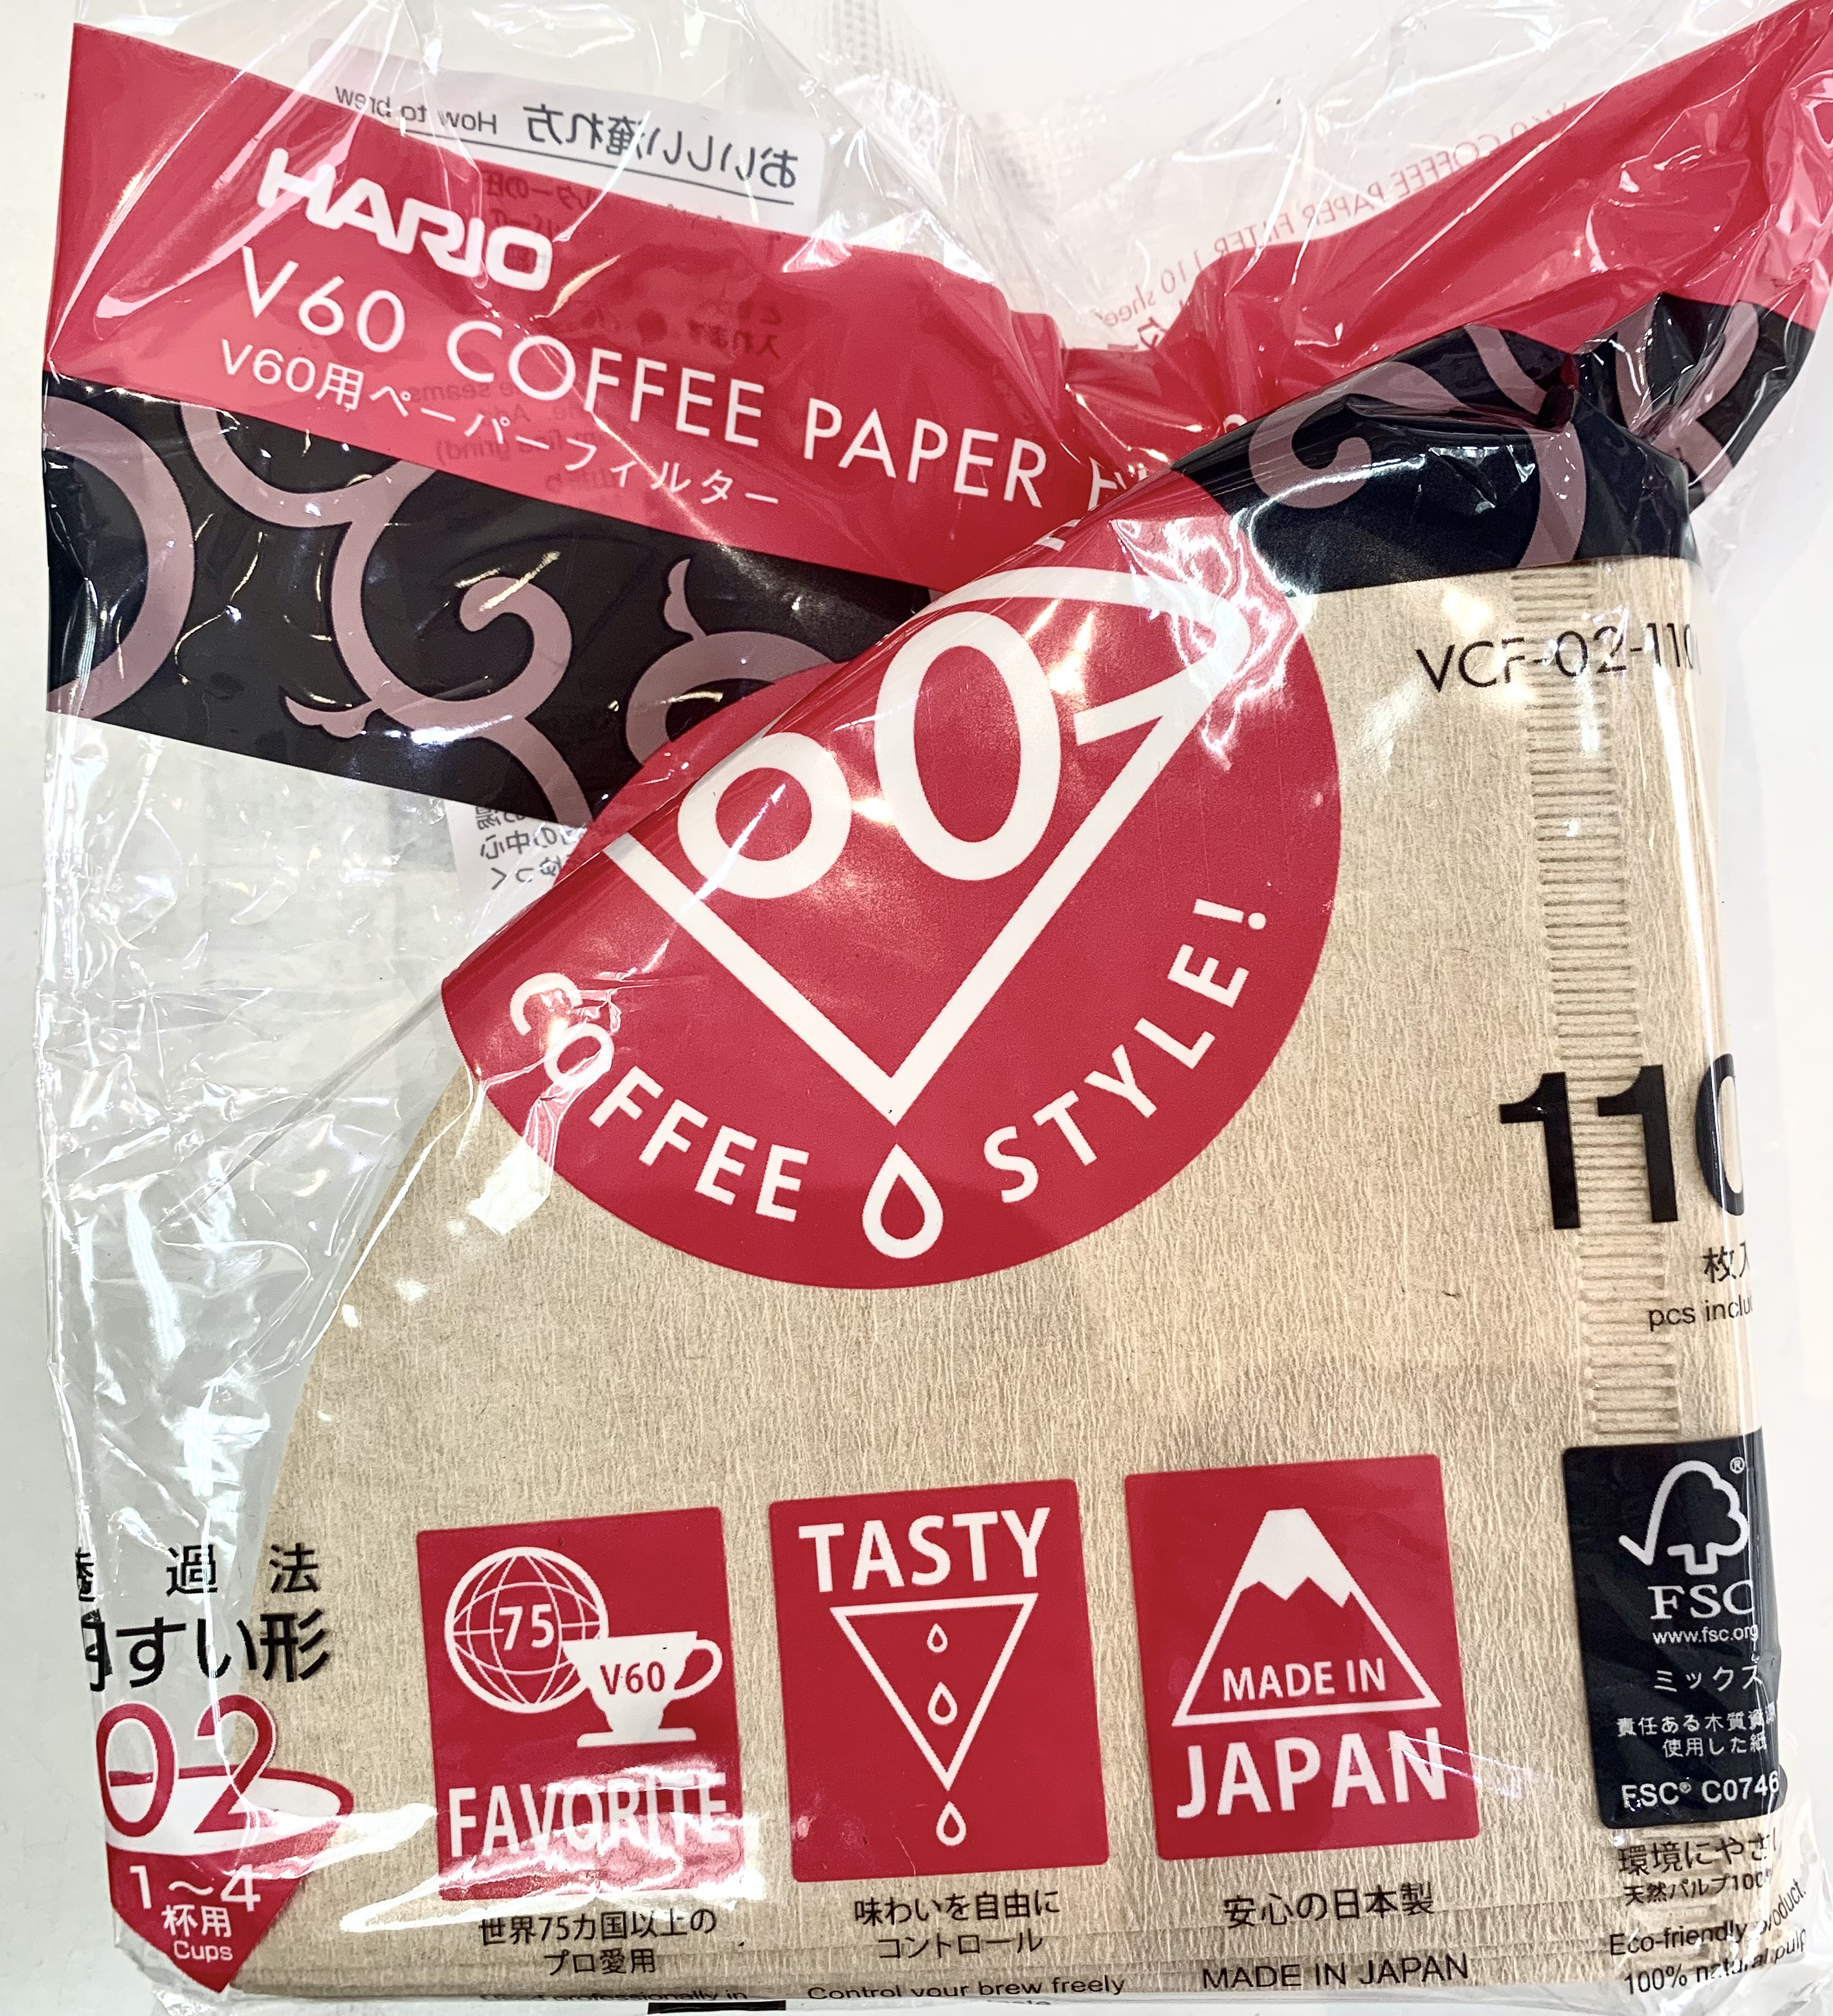 日本Hario 無漂白濾紙2-4人份1